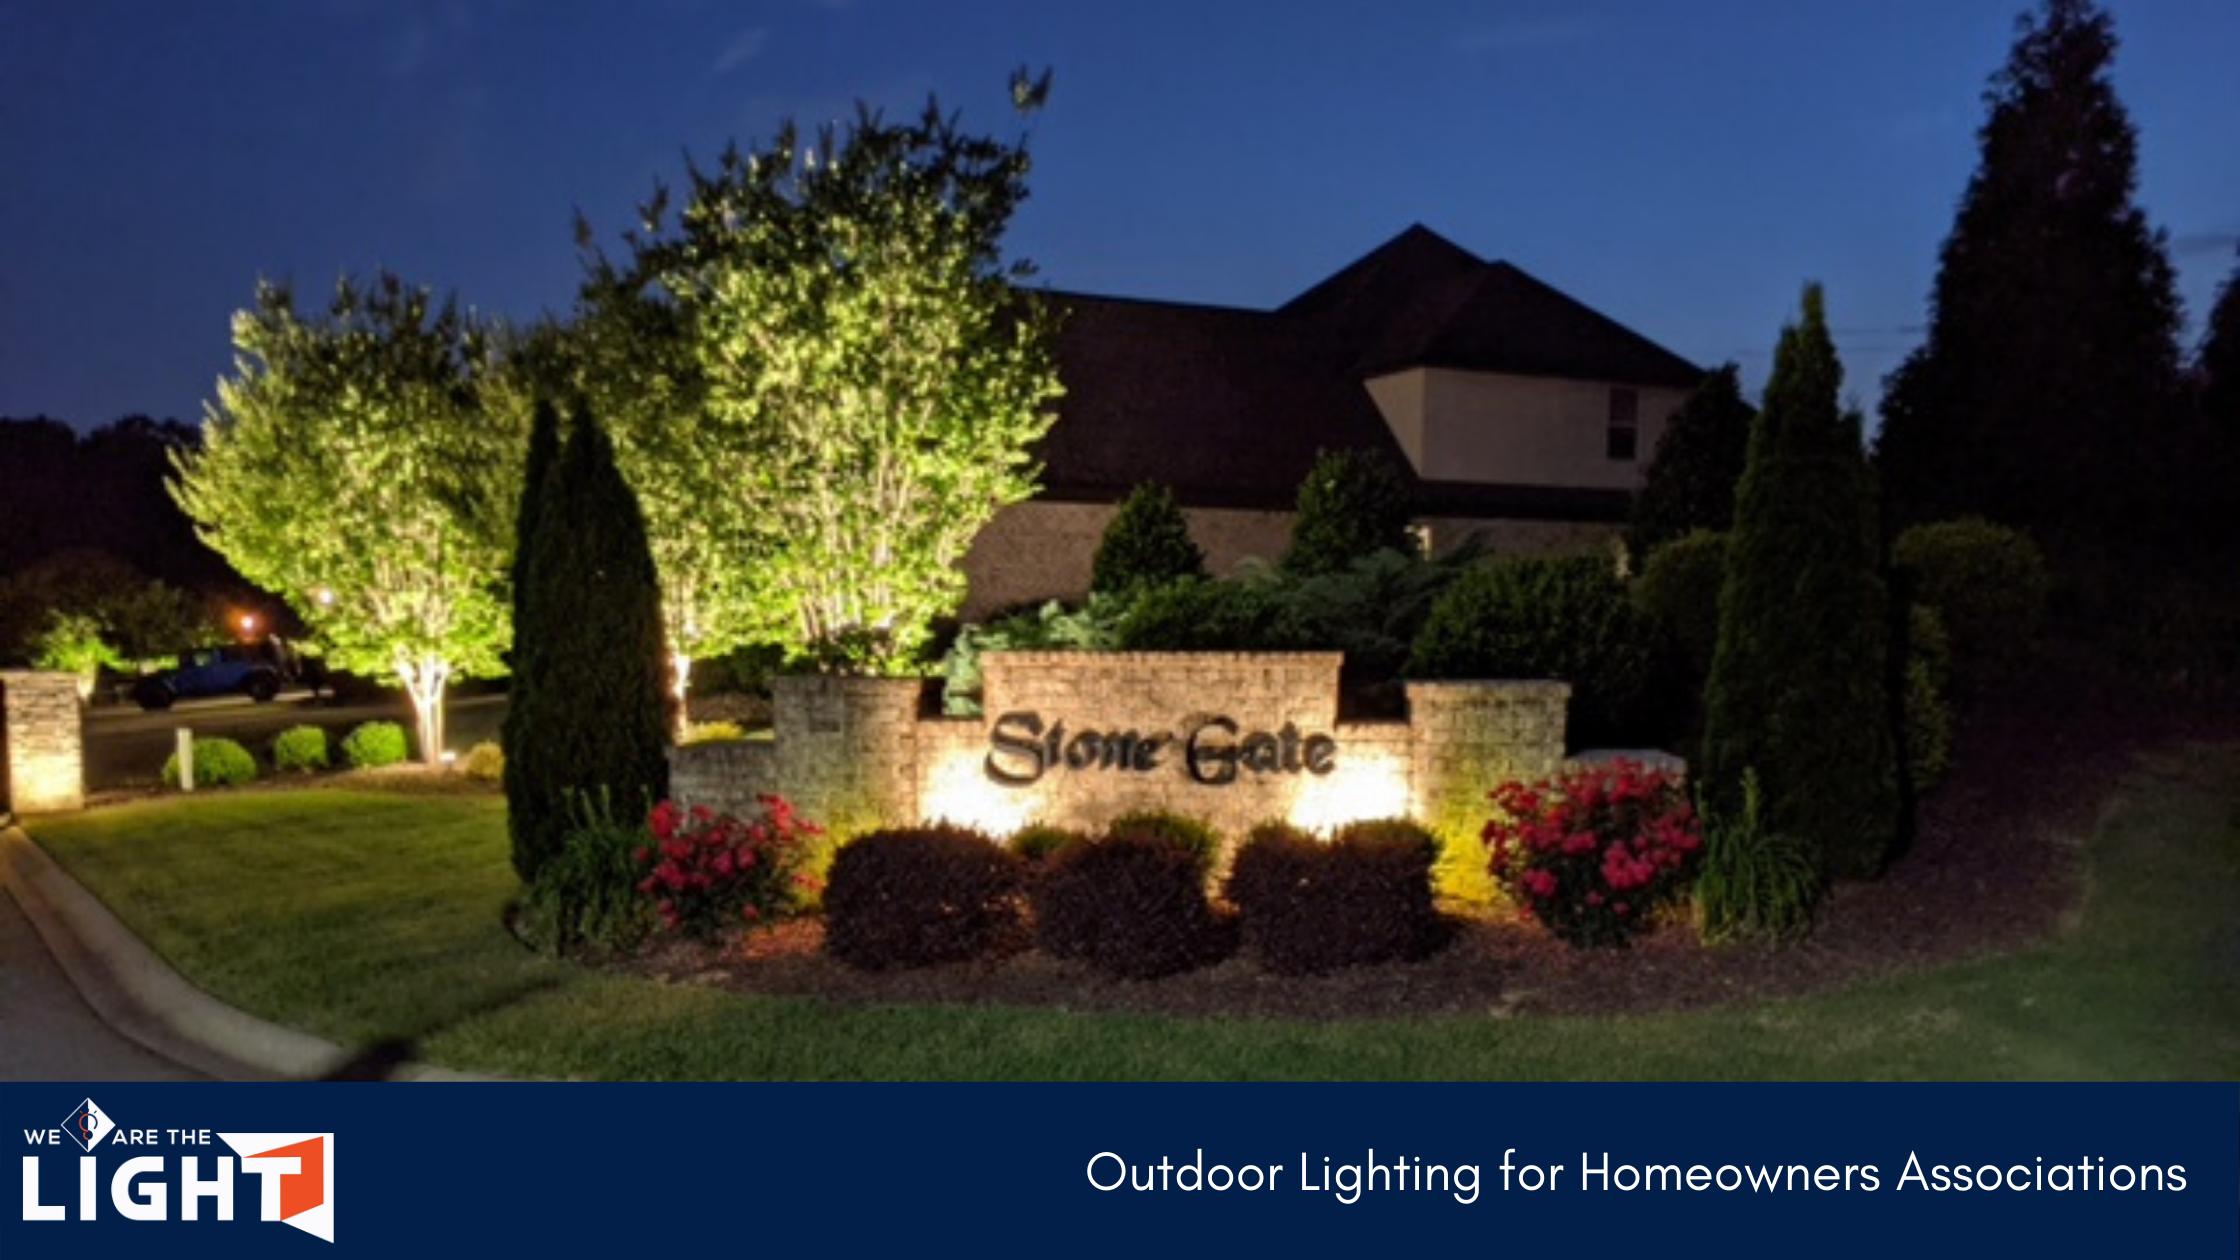 Homeowners Associations Outdoor Lighting